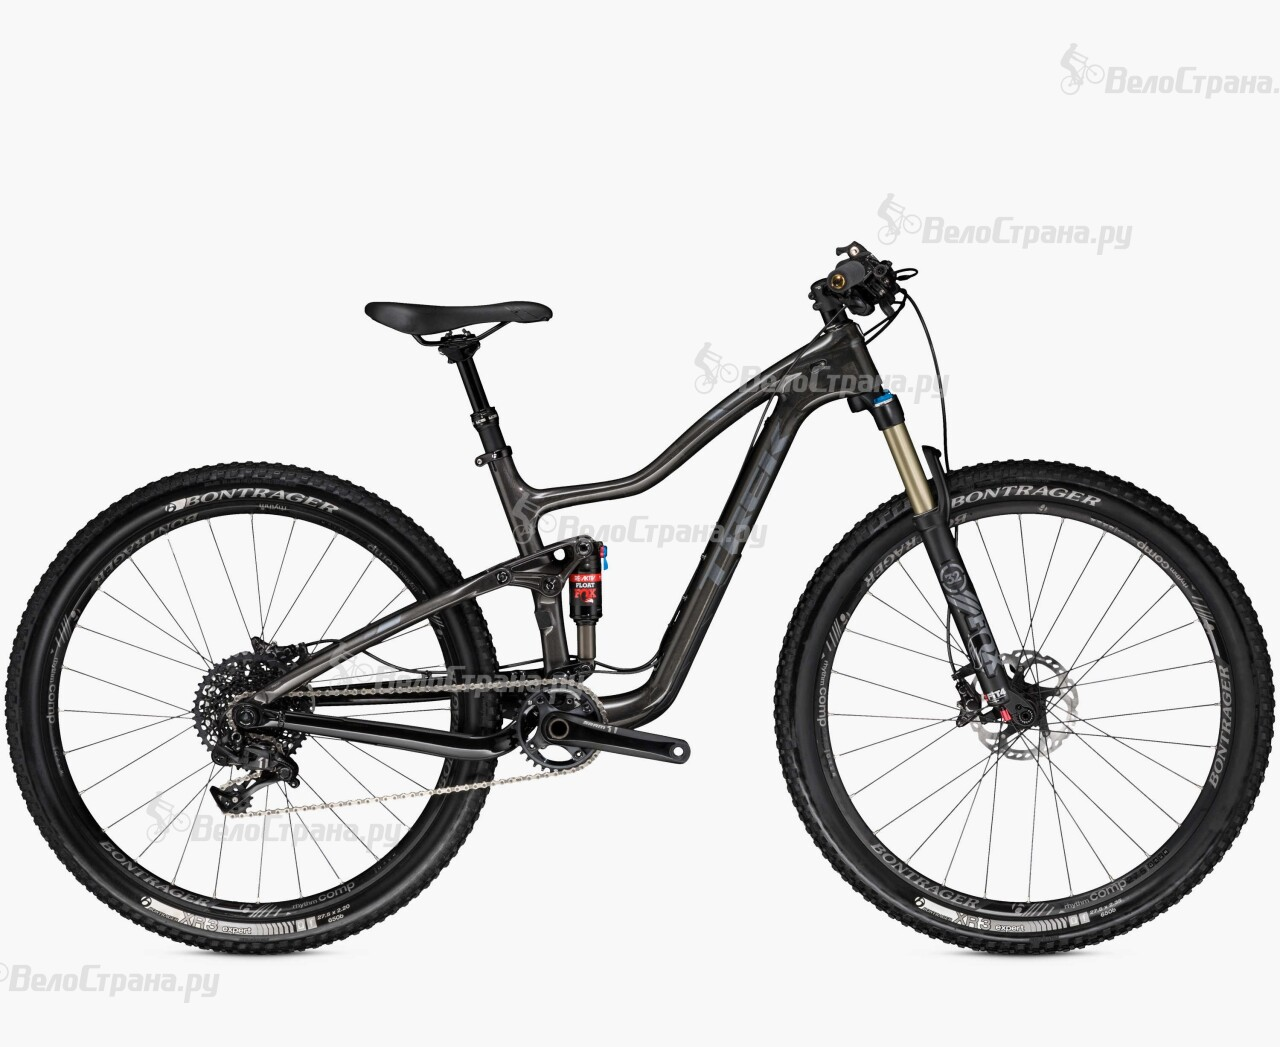 Велосипед Trek Lush Carbon 27.5 Women's (2016) велосипед trek lush s 27 5 2015